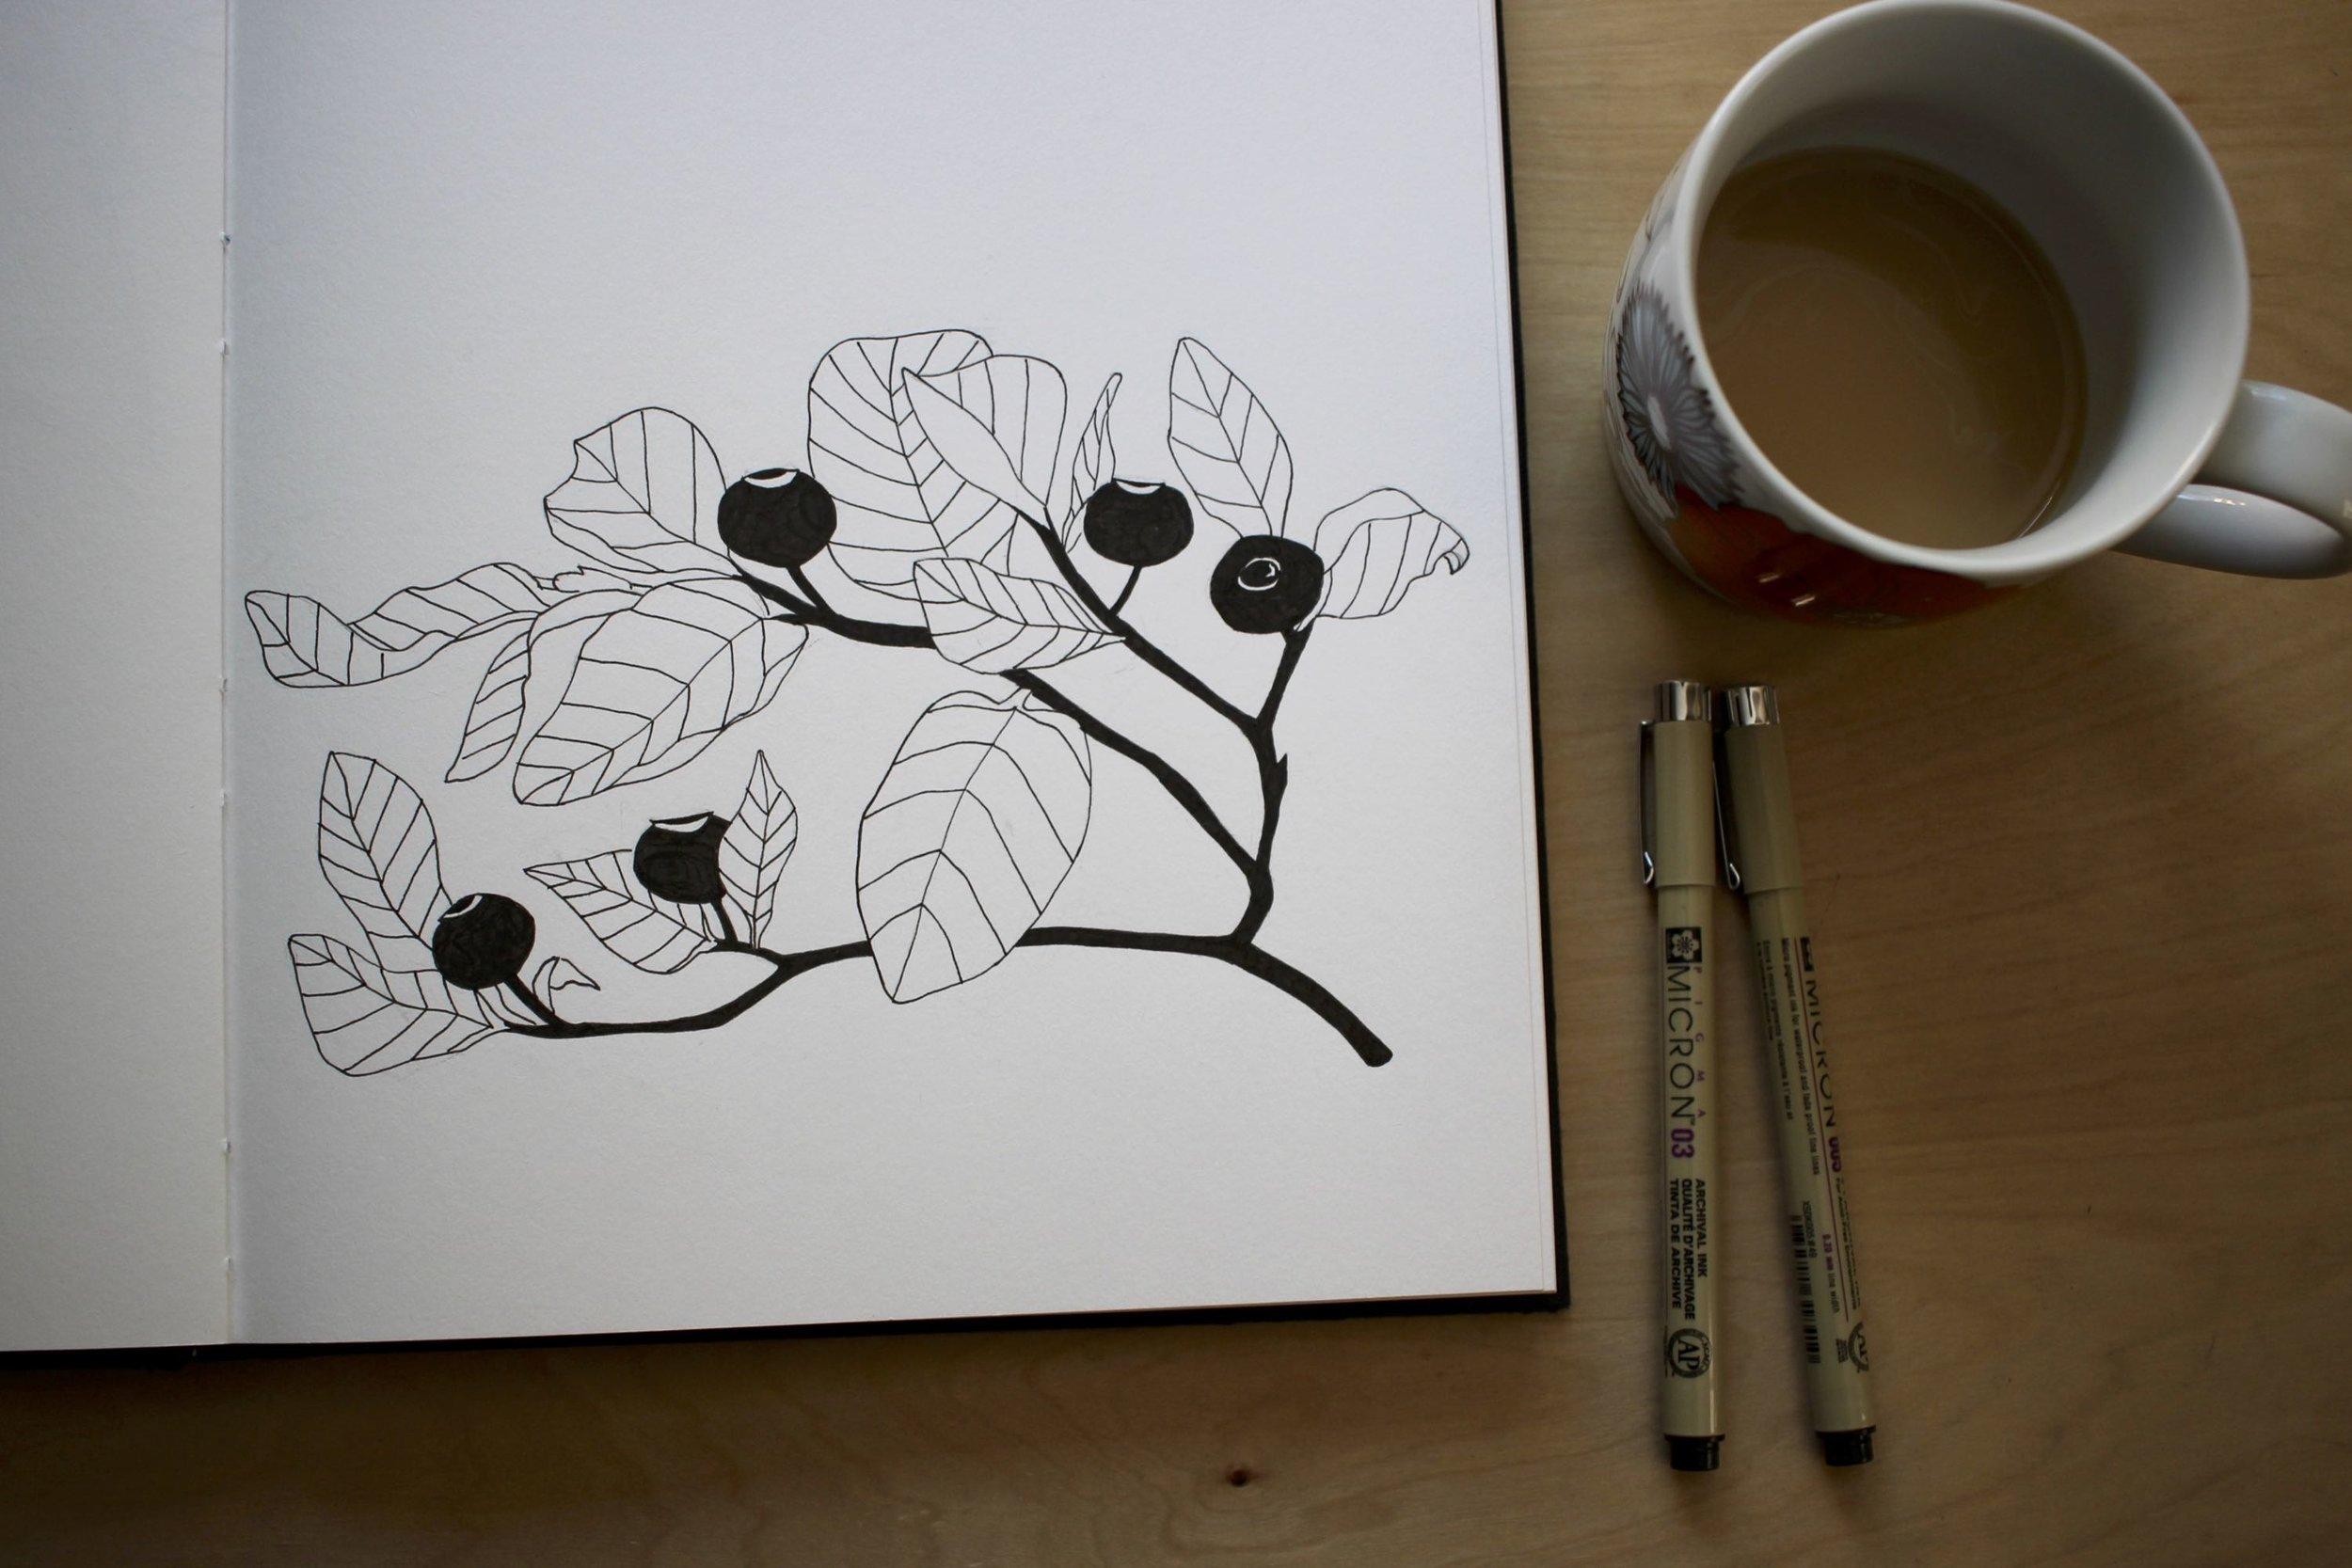 Sketchbook with huckleberry sketch